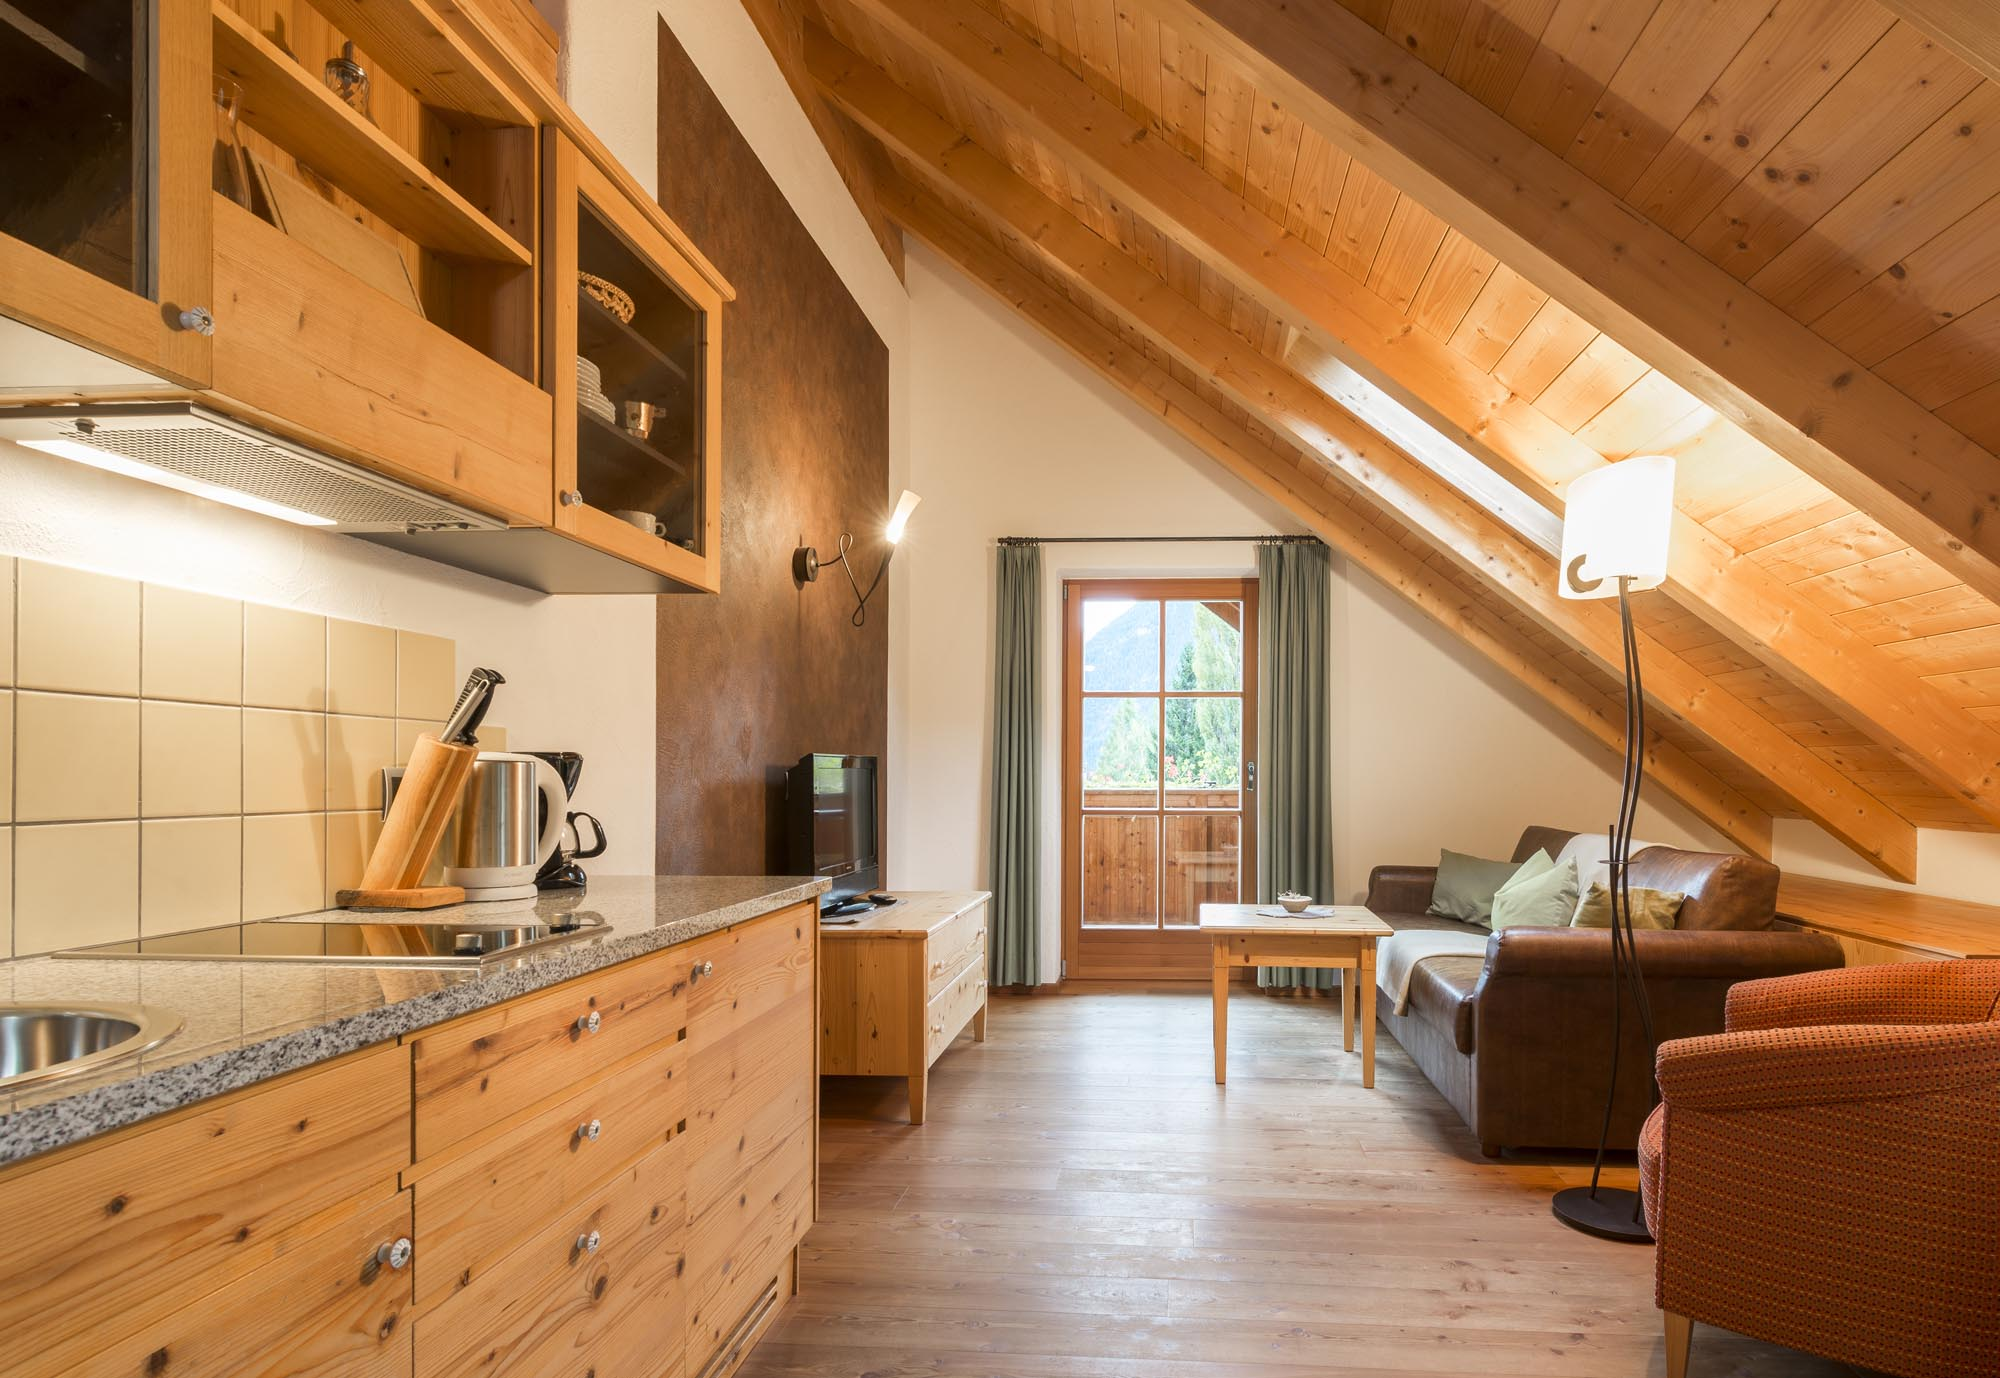 St mauritzien iv appartamenti nella valle aurina alto adige for Foto di mansarde arredate